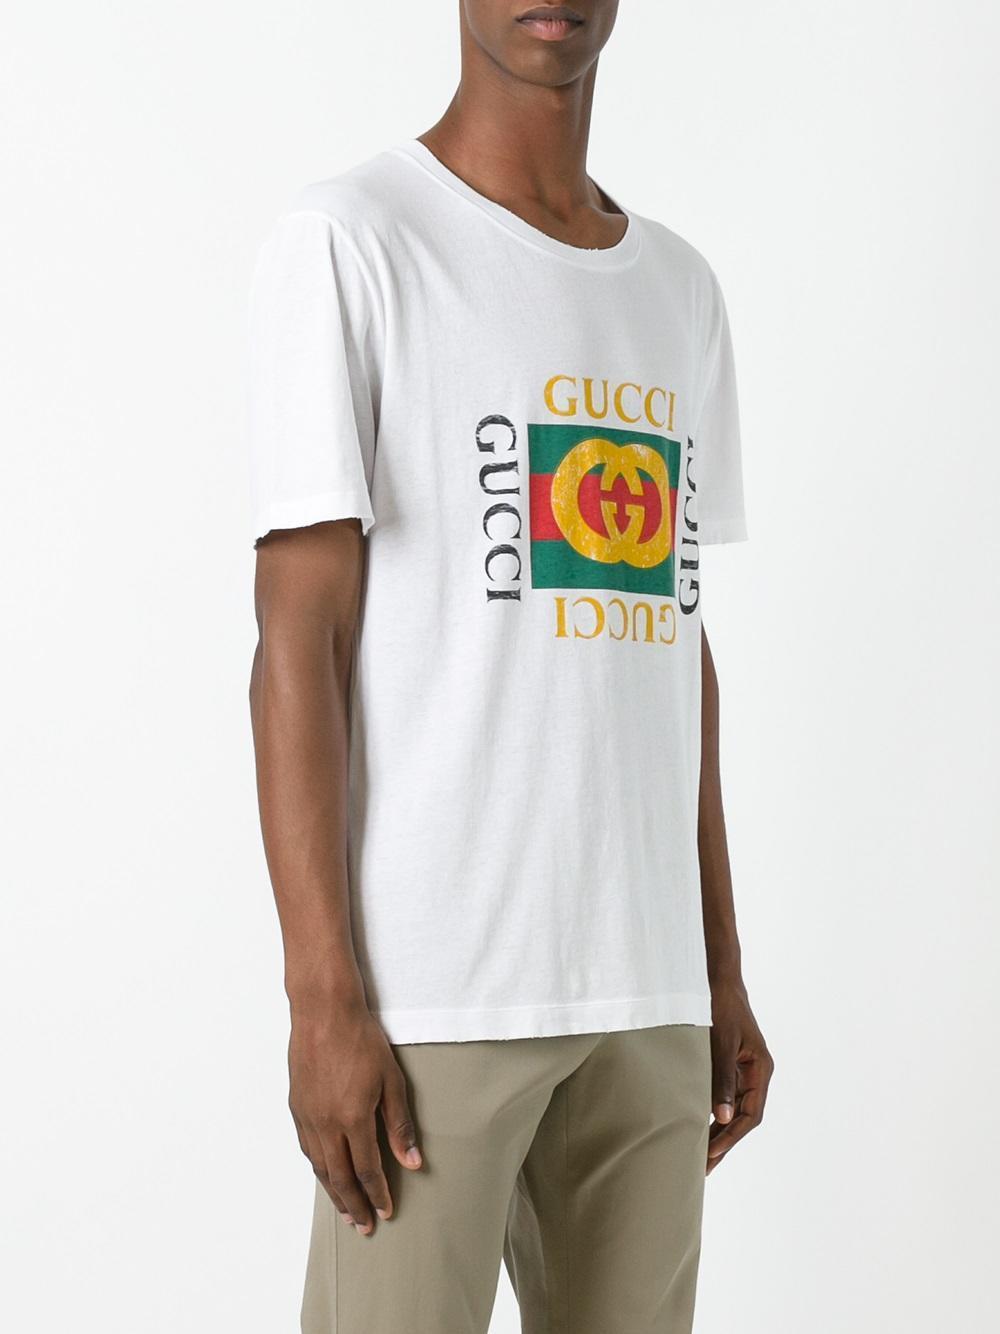 24cdd553 White Gucci Shirt Replica | The Art of Mike Mignola